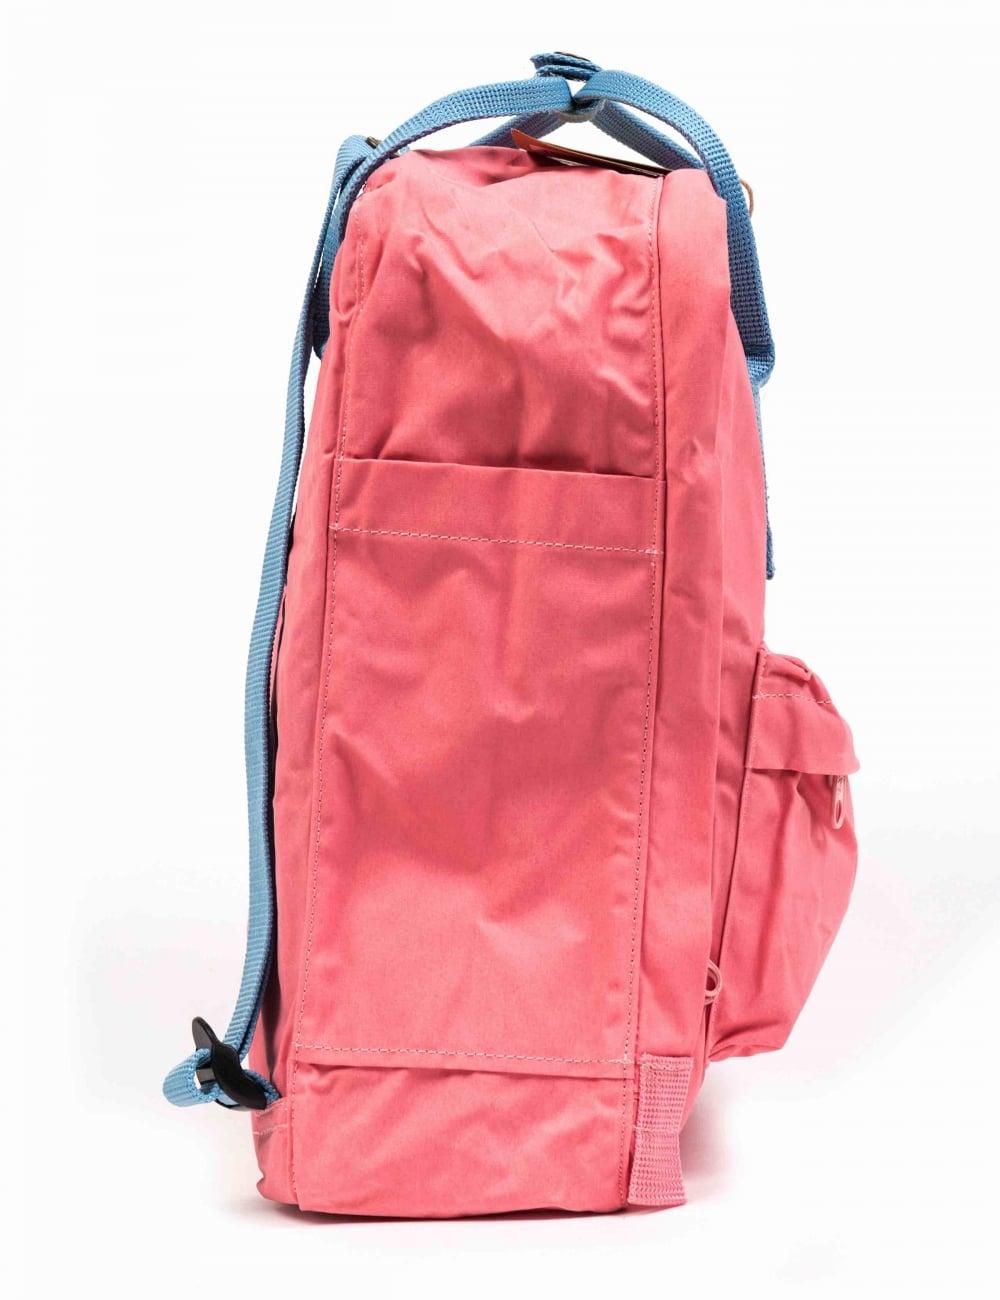 a486c2d43b7 Fjallraven Kanken Classic Backpack - Pink Air Blue - Accessories ...